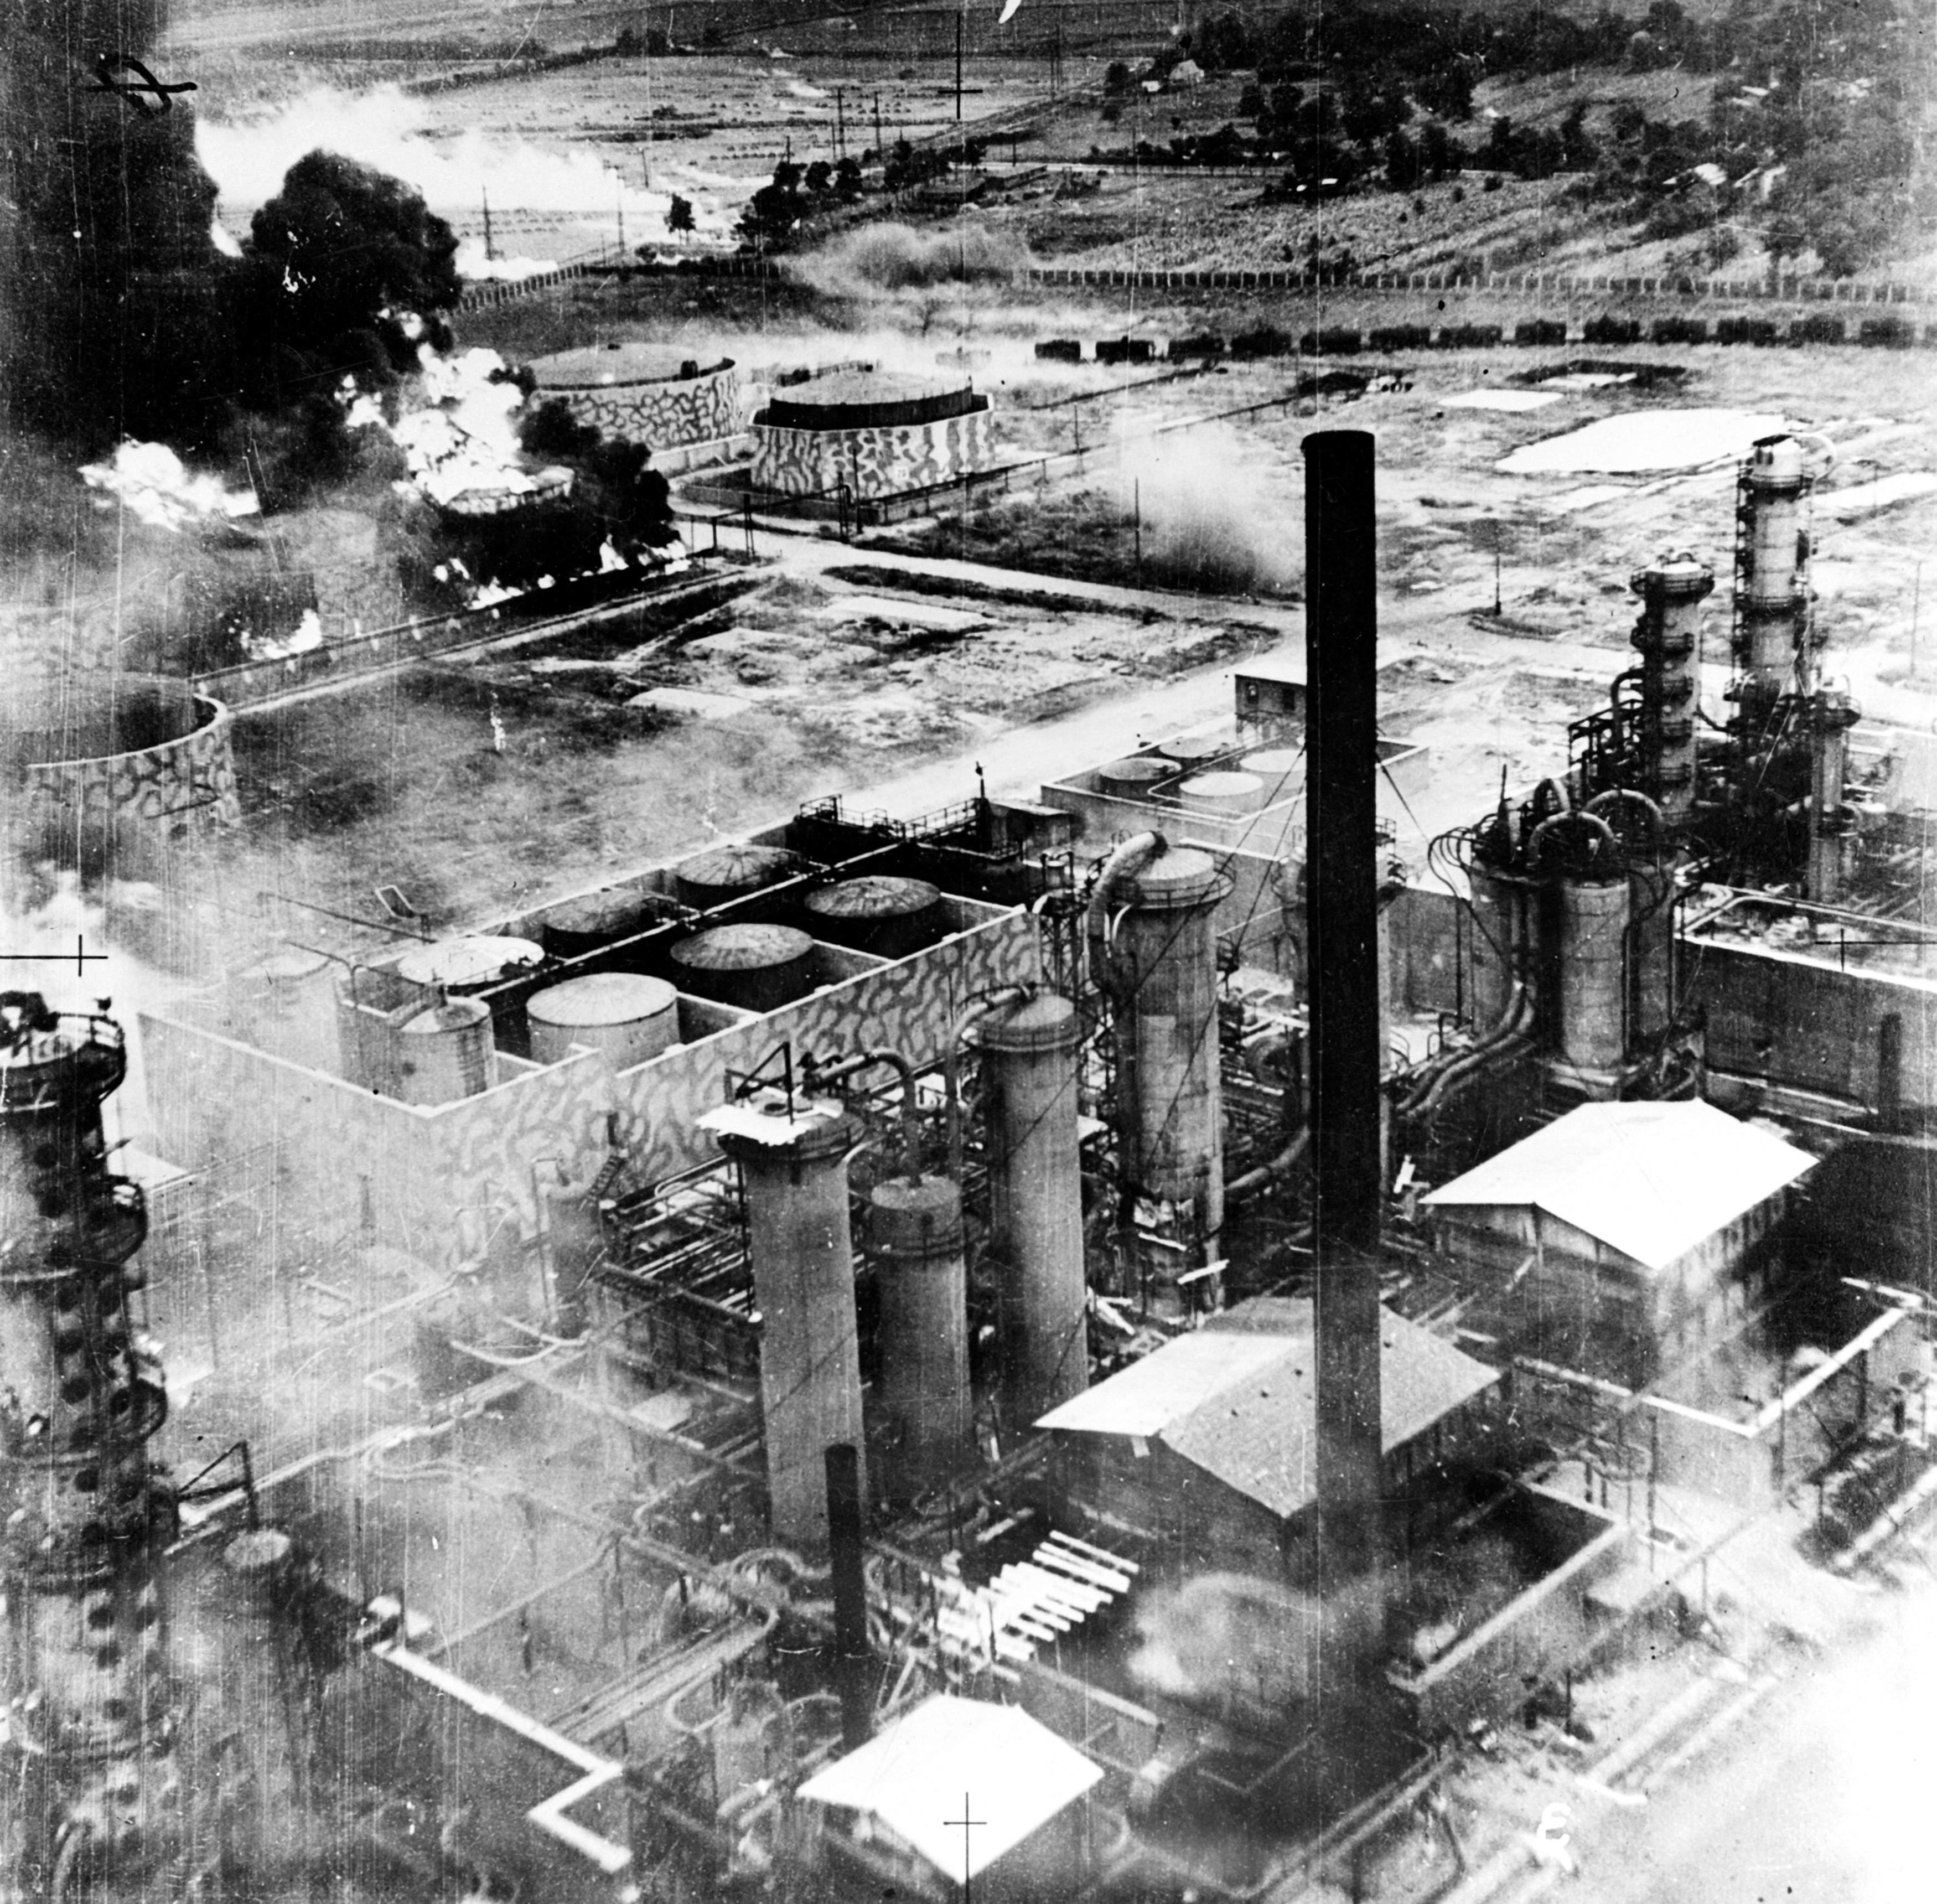 File:Ploiesti 1943 bombardament.jpg